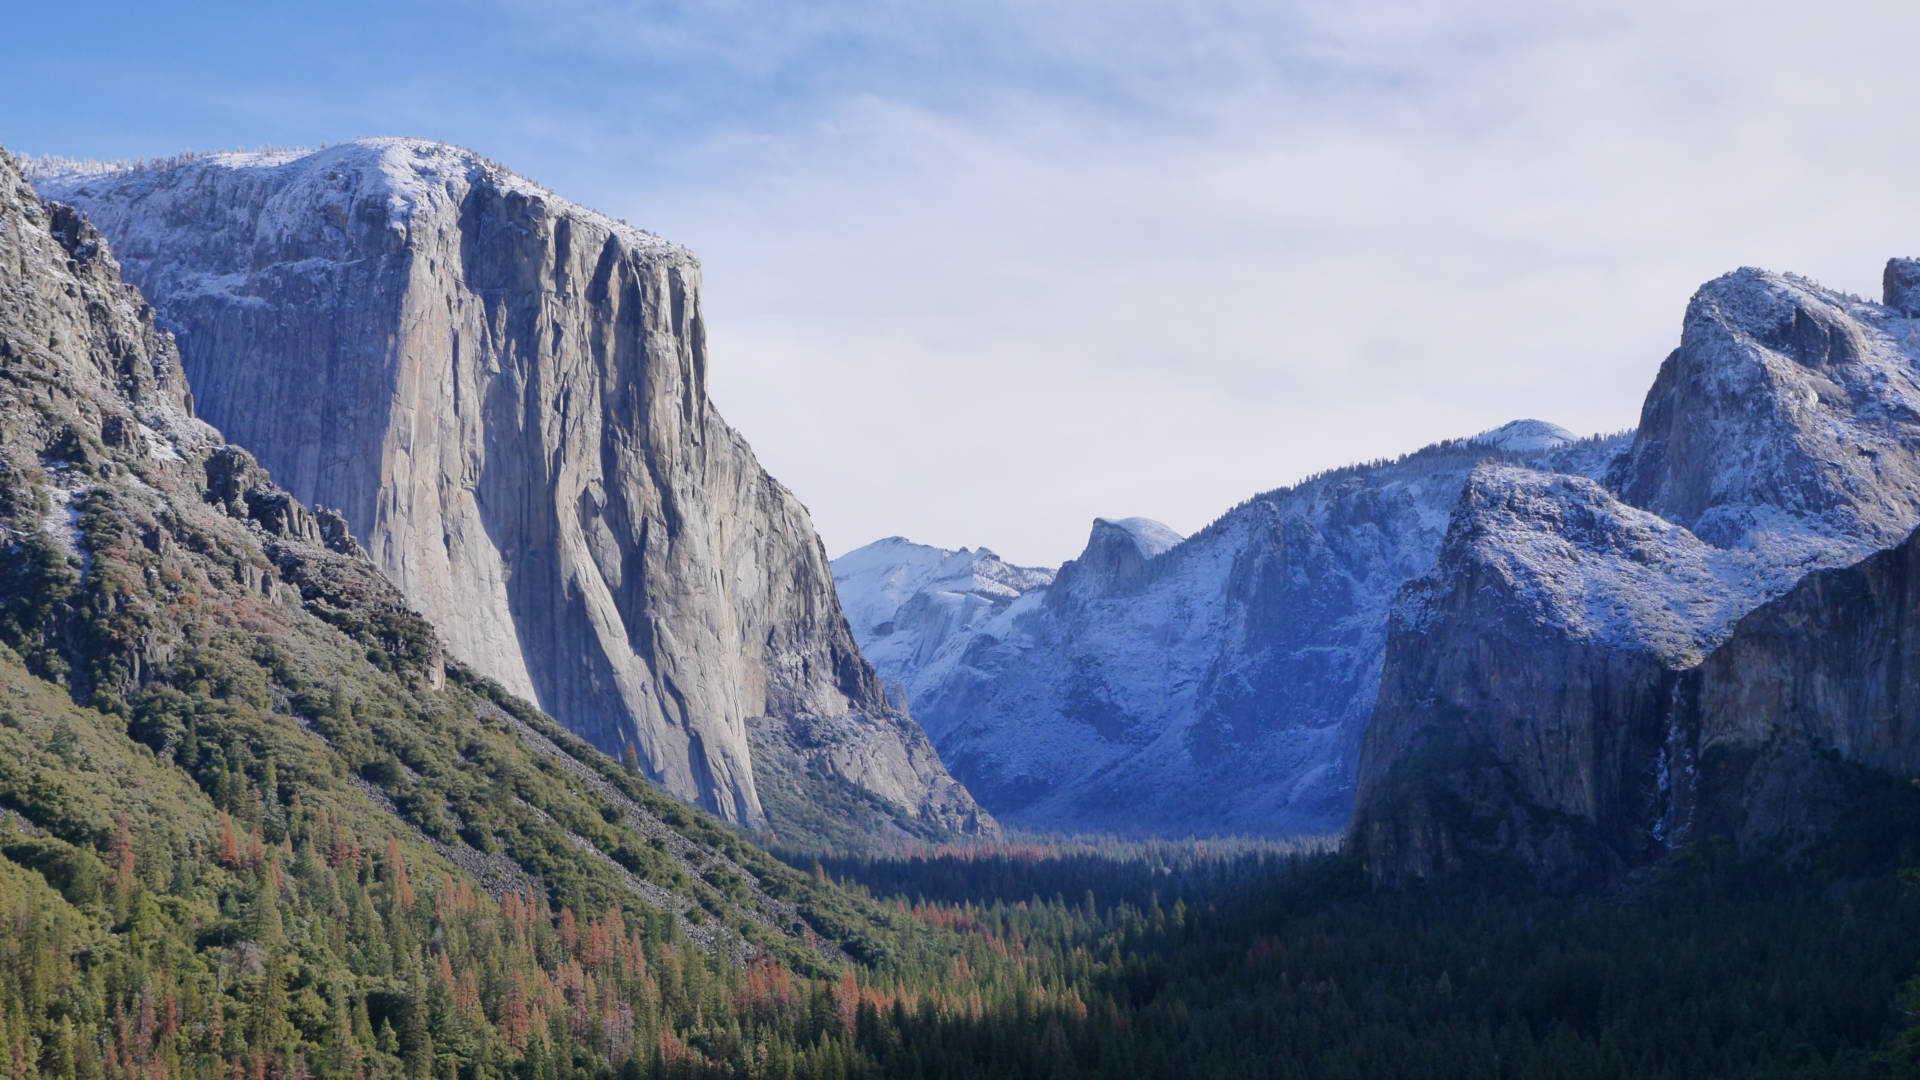 The first snow of winter coating El Capitan and the surrounding mountains in Yosemite National Park, California.  Joseph Pontecorvo/@ THIRTEEN Productions LLC